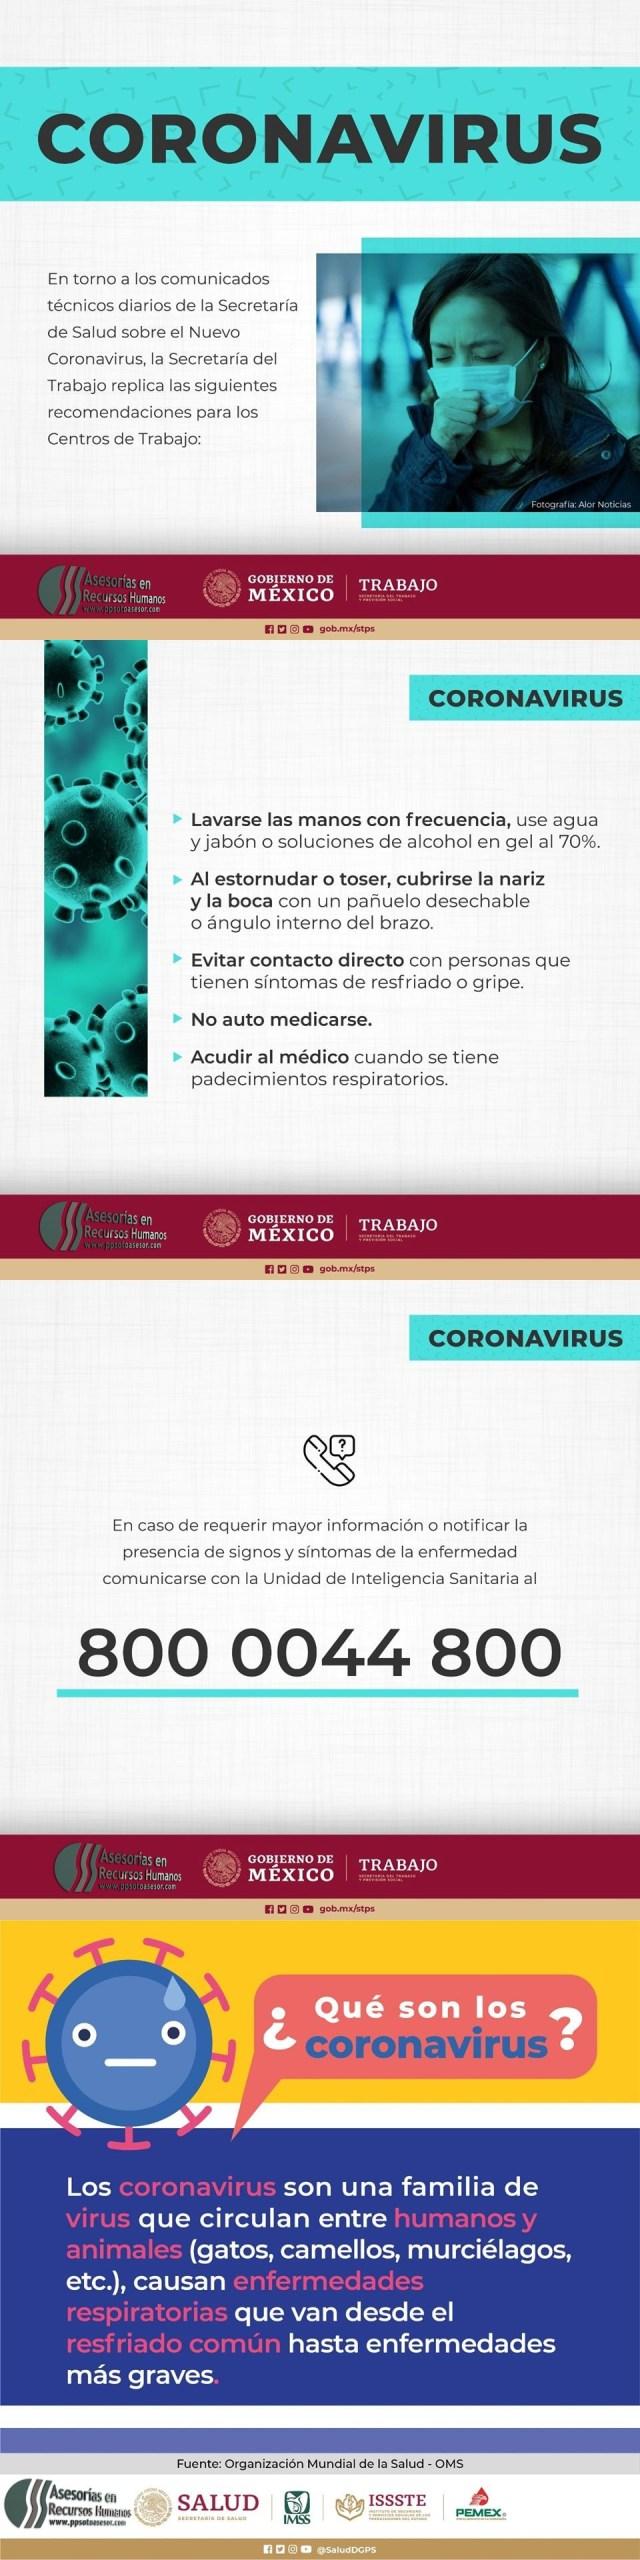 cuidados #coronavirus